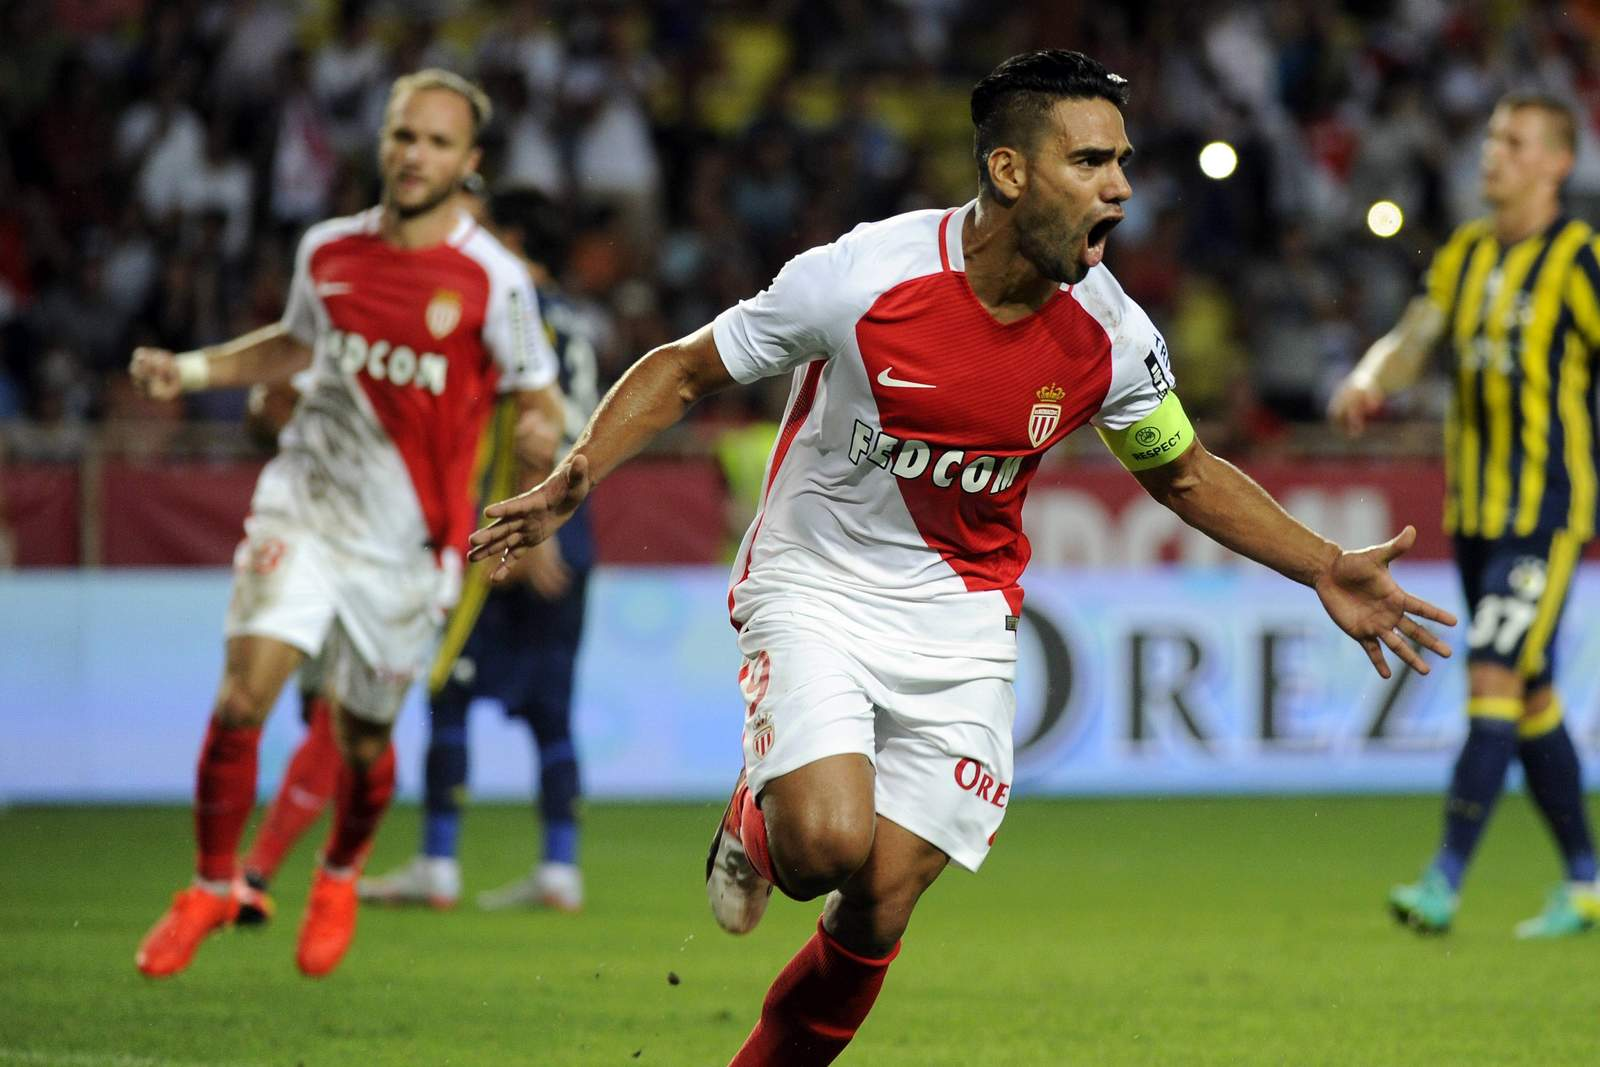 Jubelt Falcao wieder? Unser Tipp: Villarreal gewinnt gegen Monaco